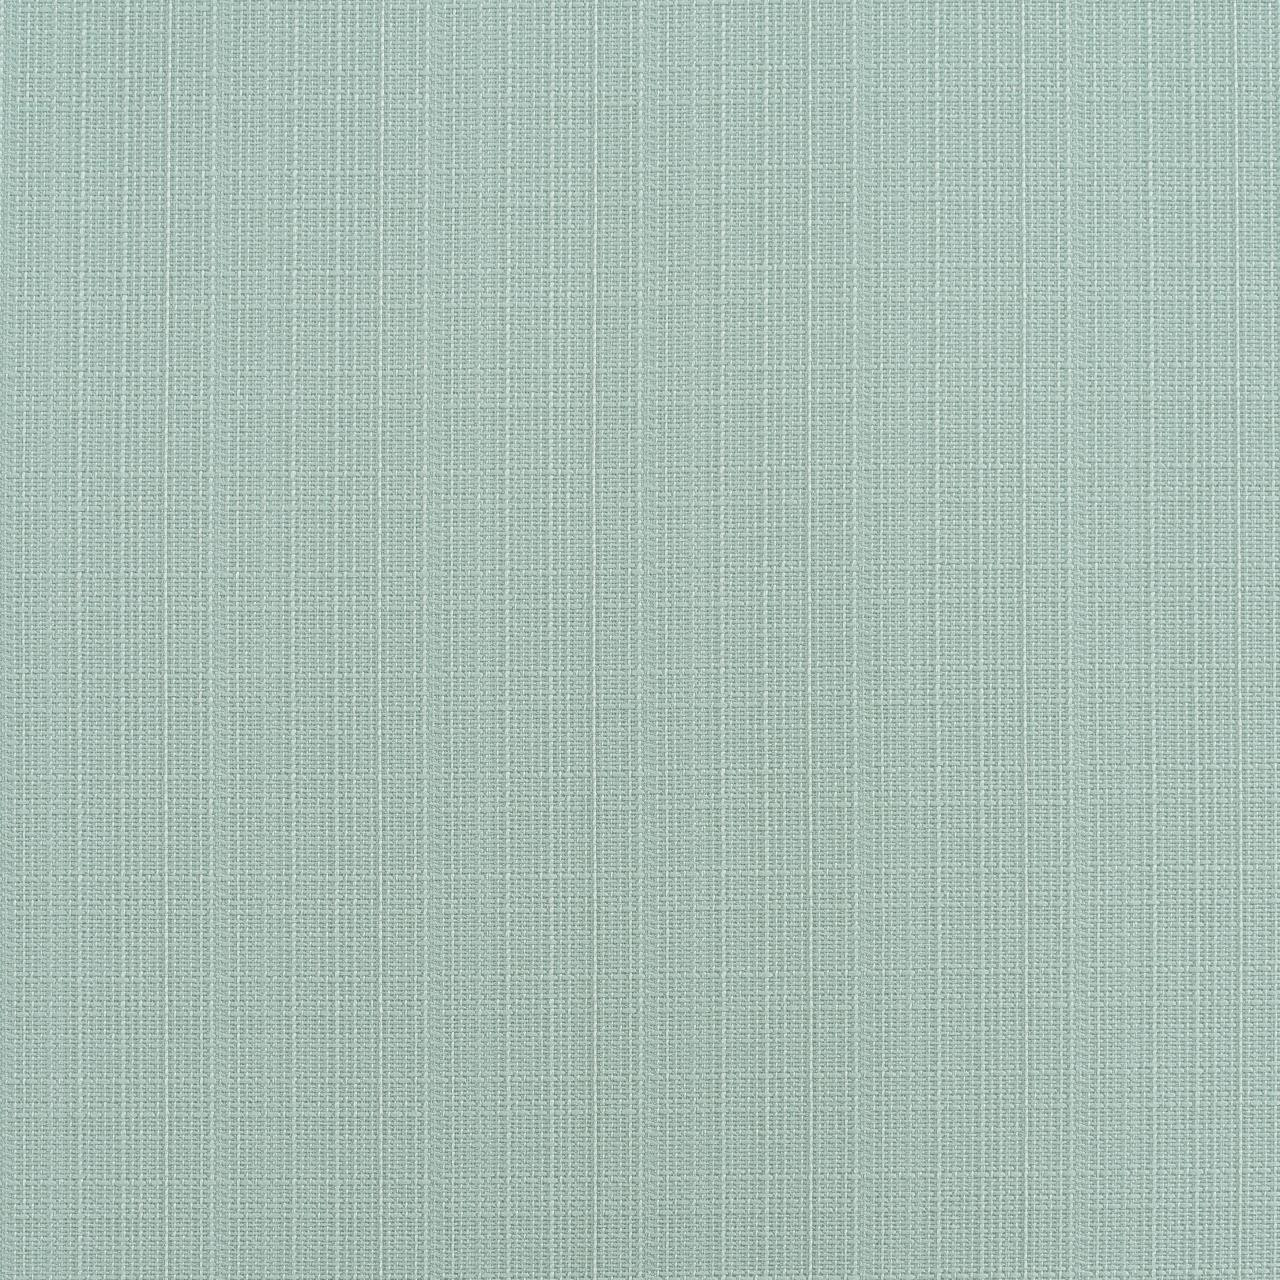 Water's Edge Aqua Curtain Pair - 846339098352